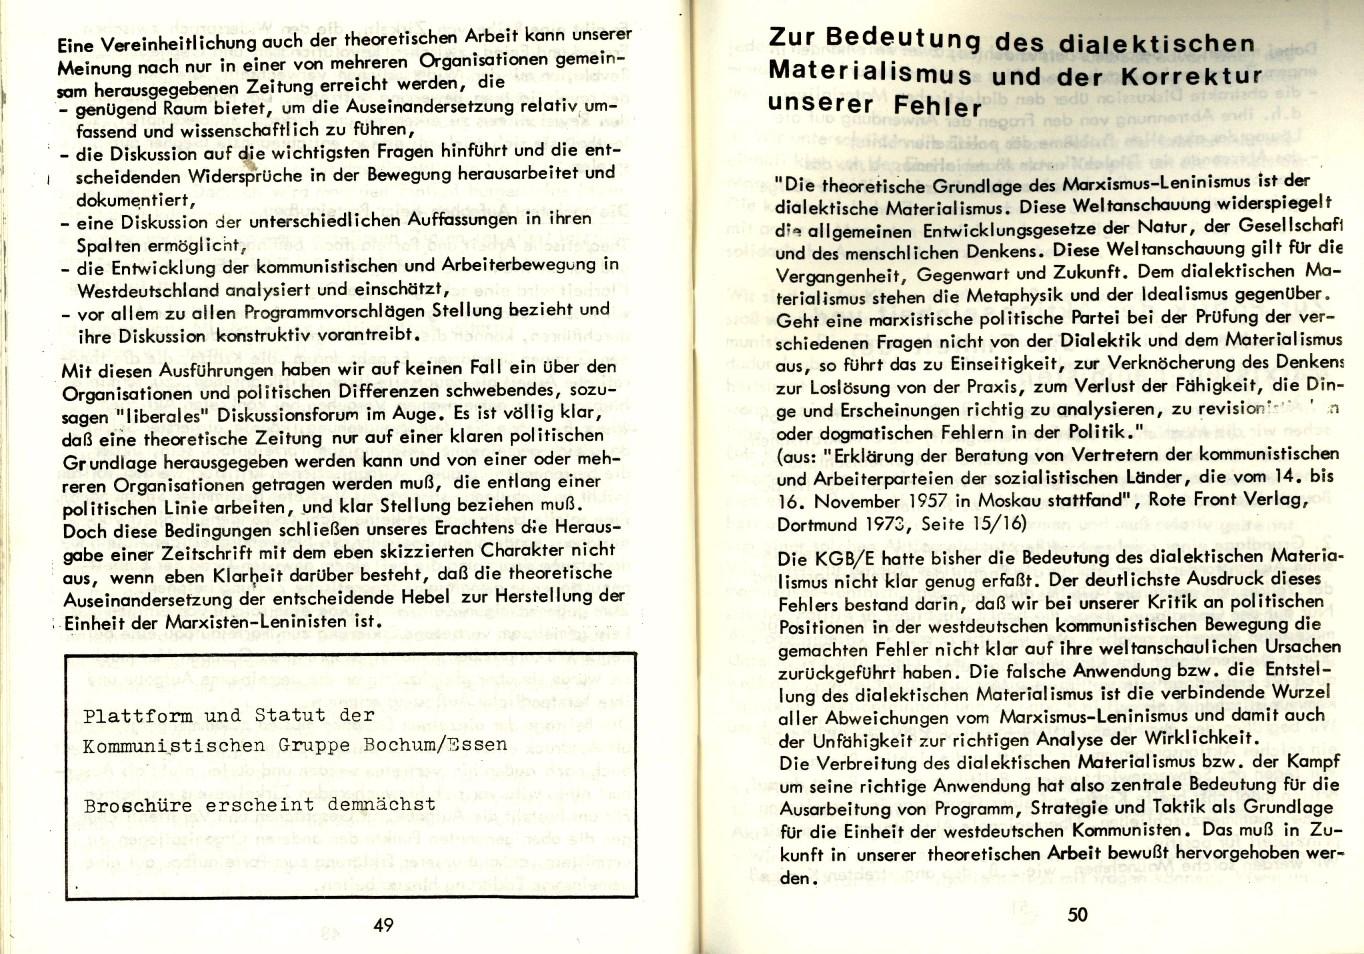 KGBE_1978_Resolutionen_26